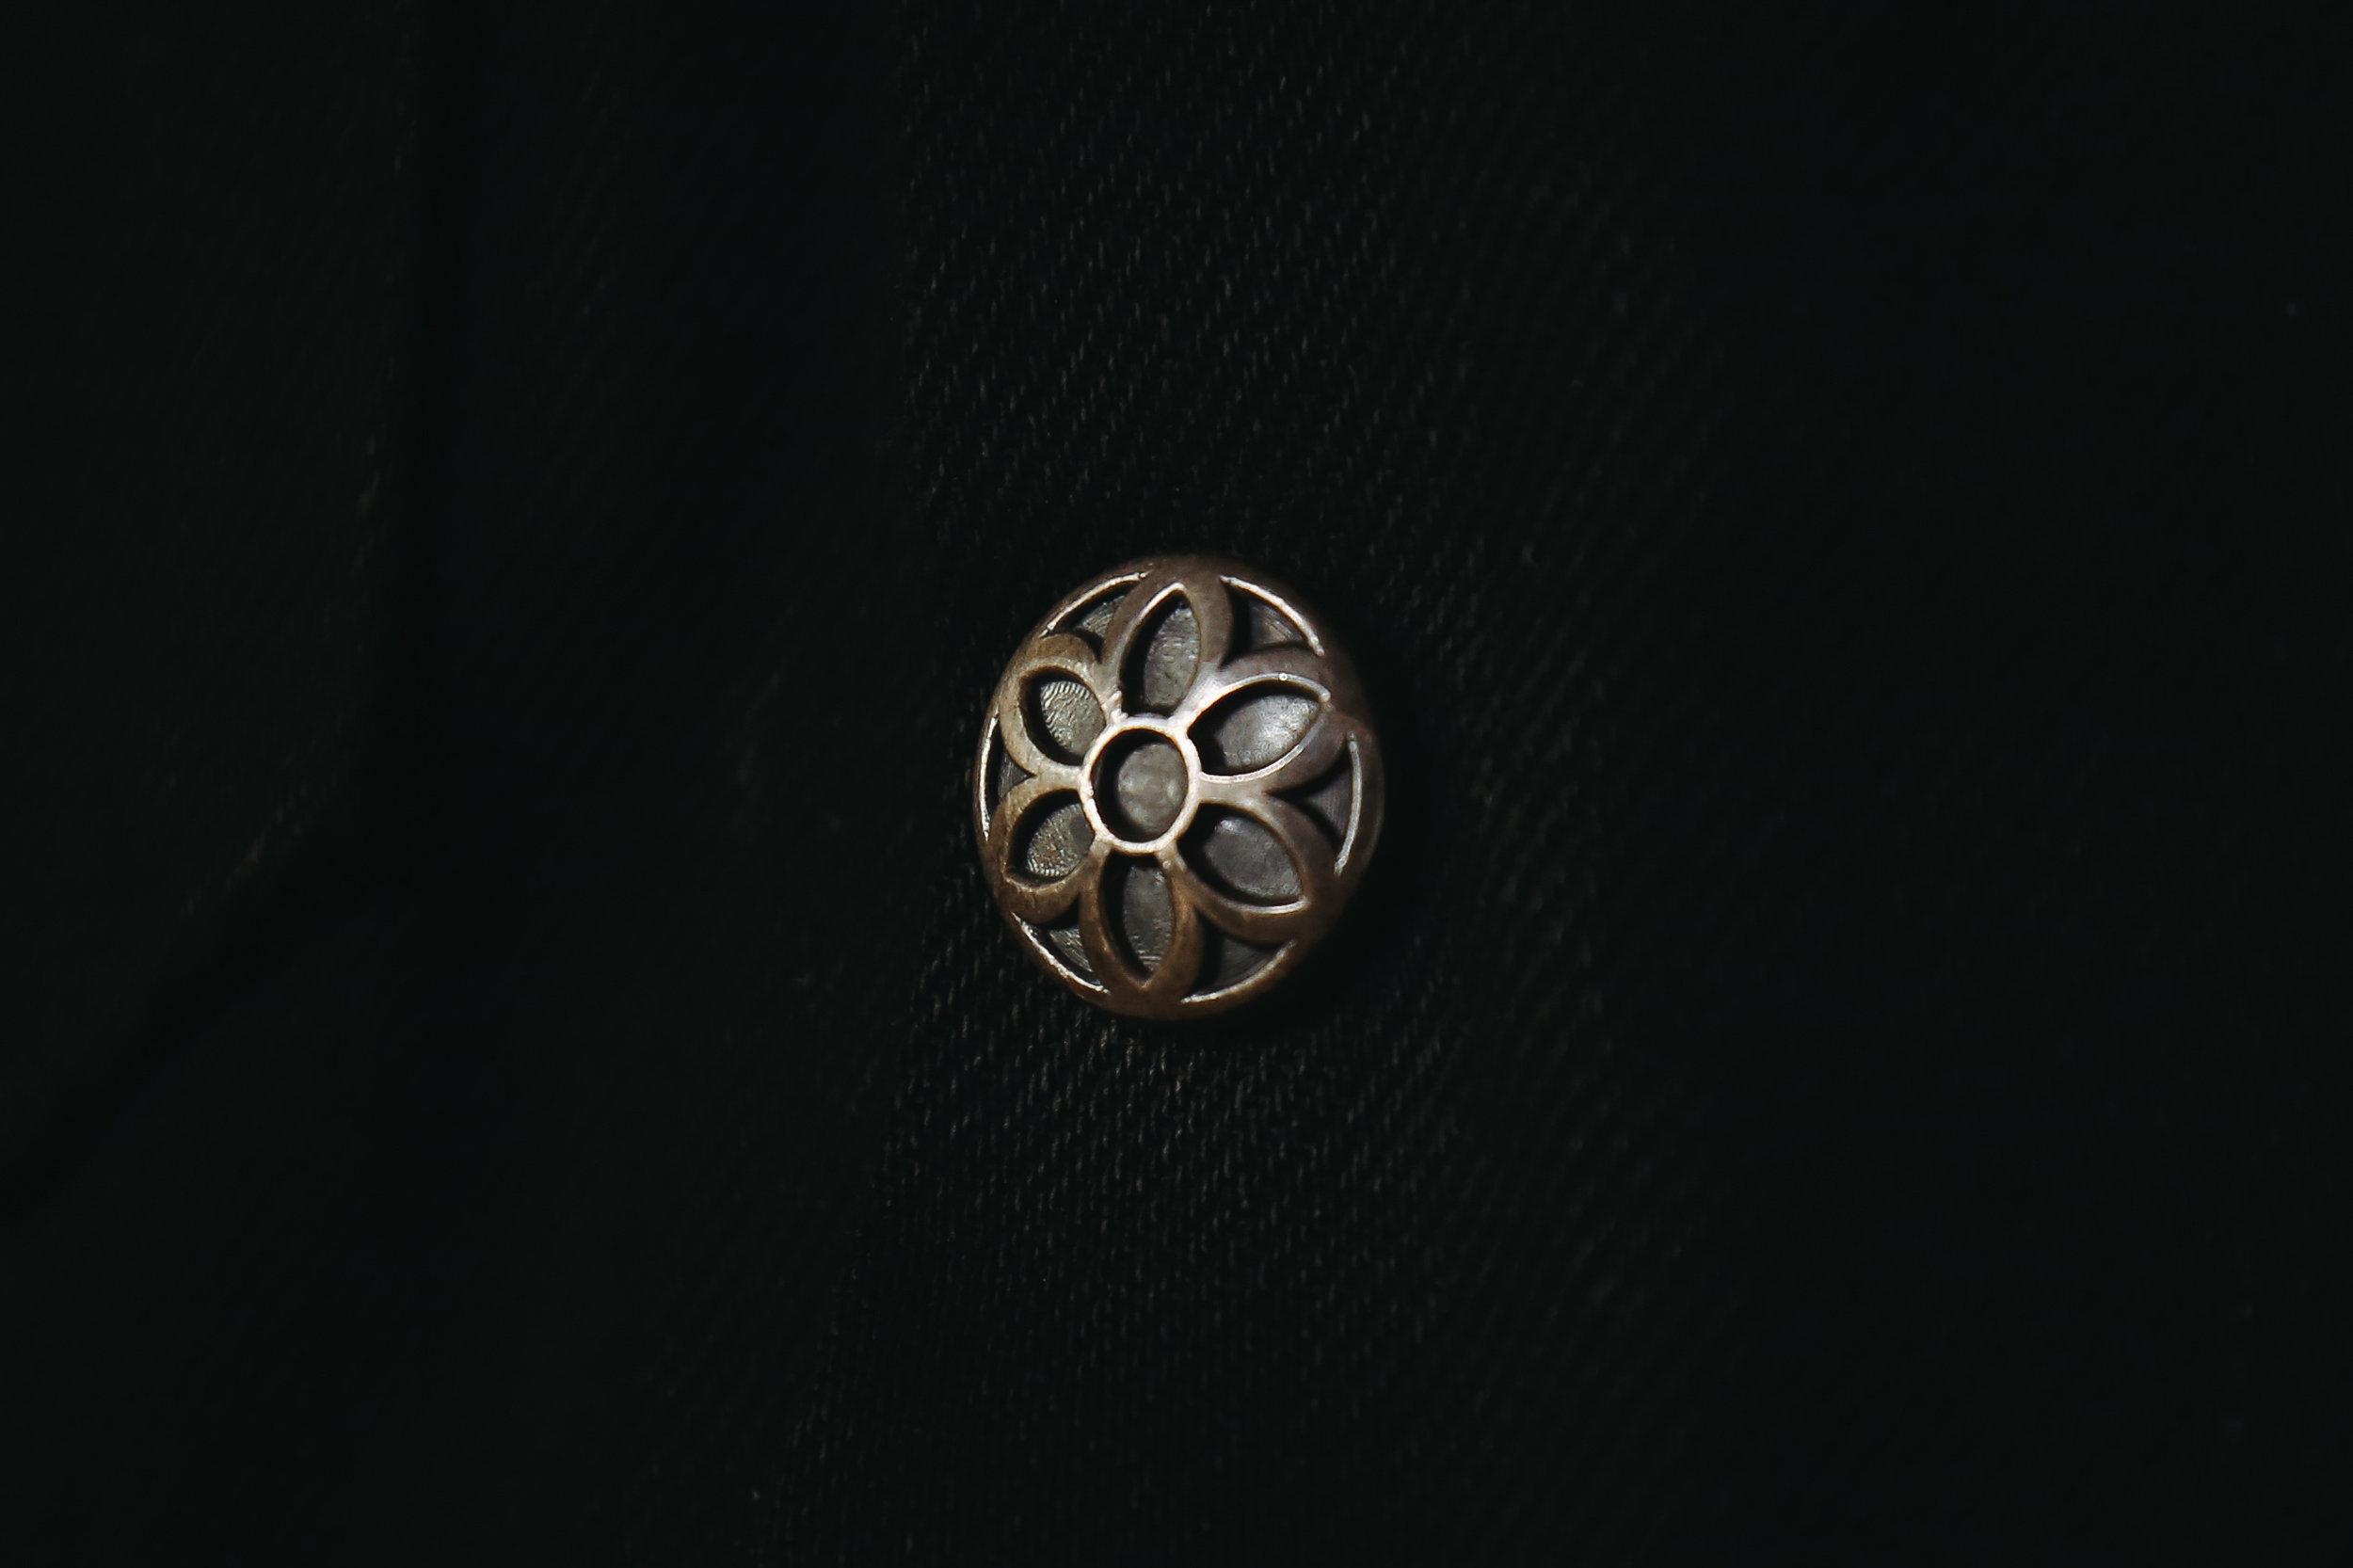 Ship John x  GOODARTHLYWD :special 16oz Kuroki mills black selvedge denim Wills Jacket with sterling silver snaps.